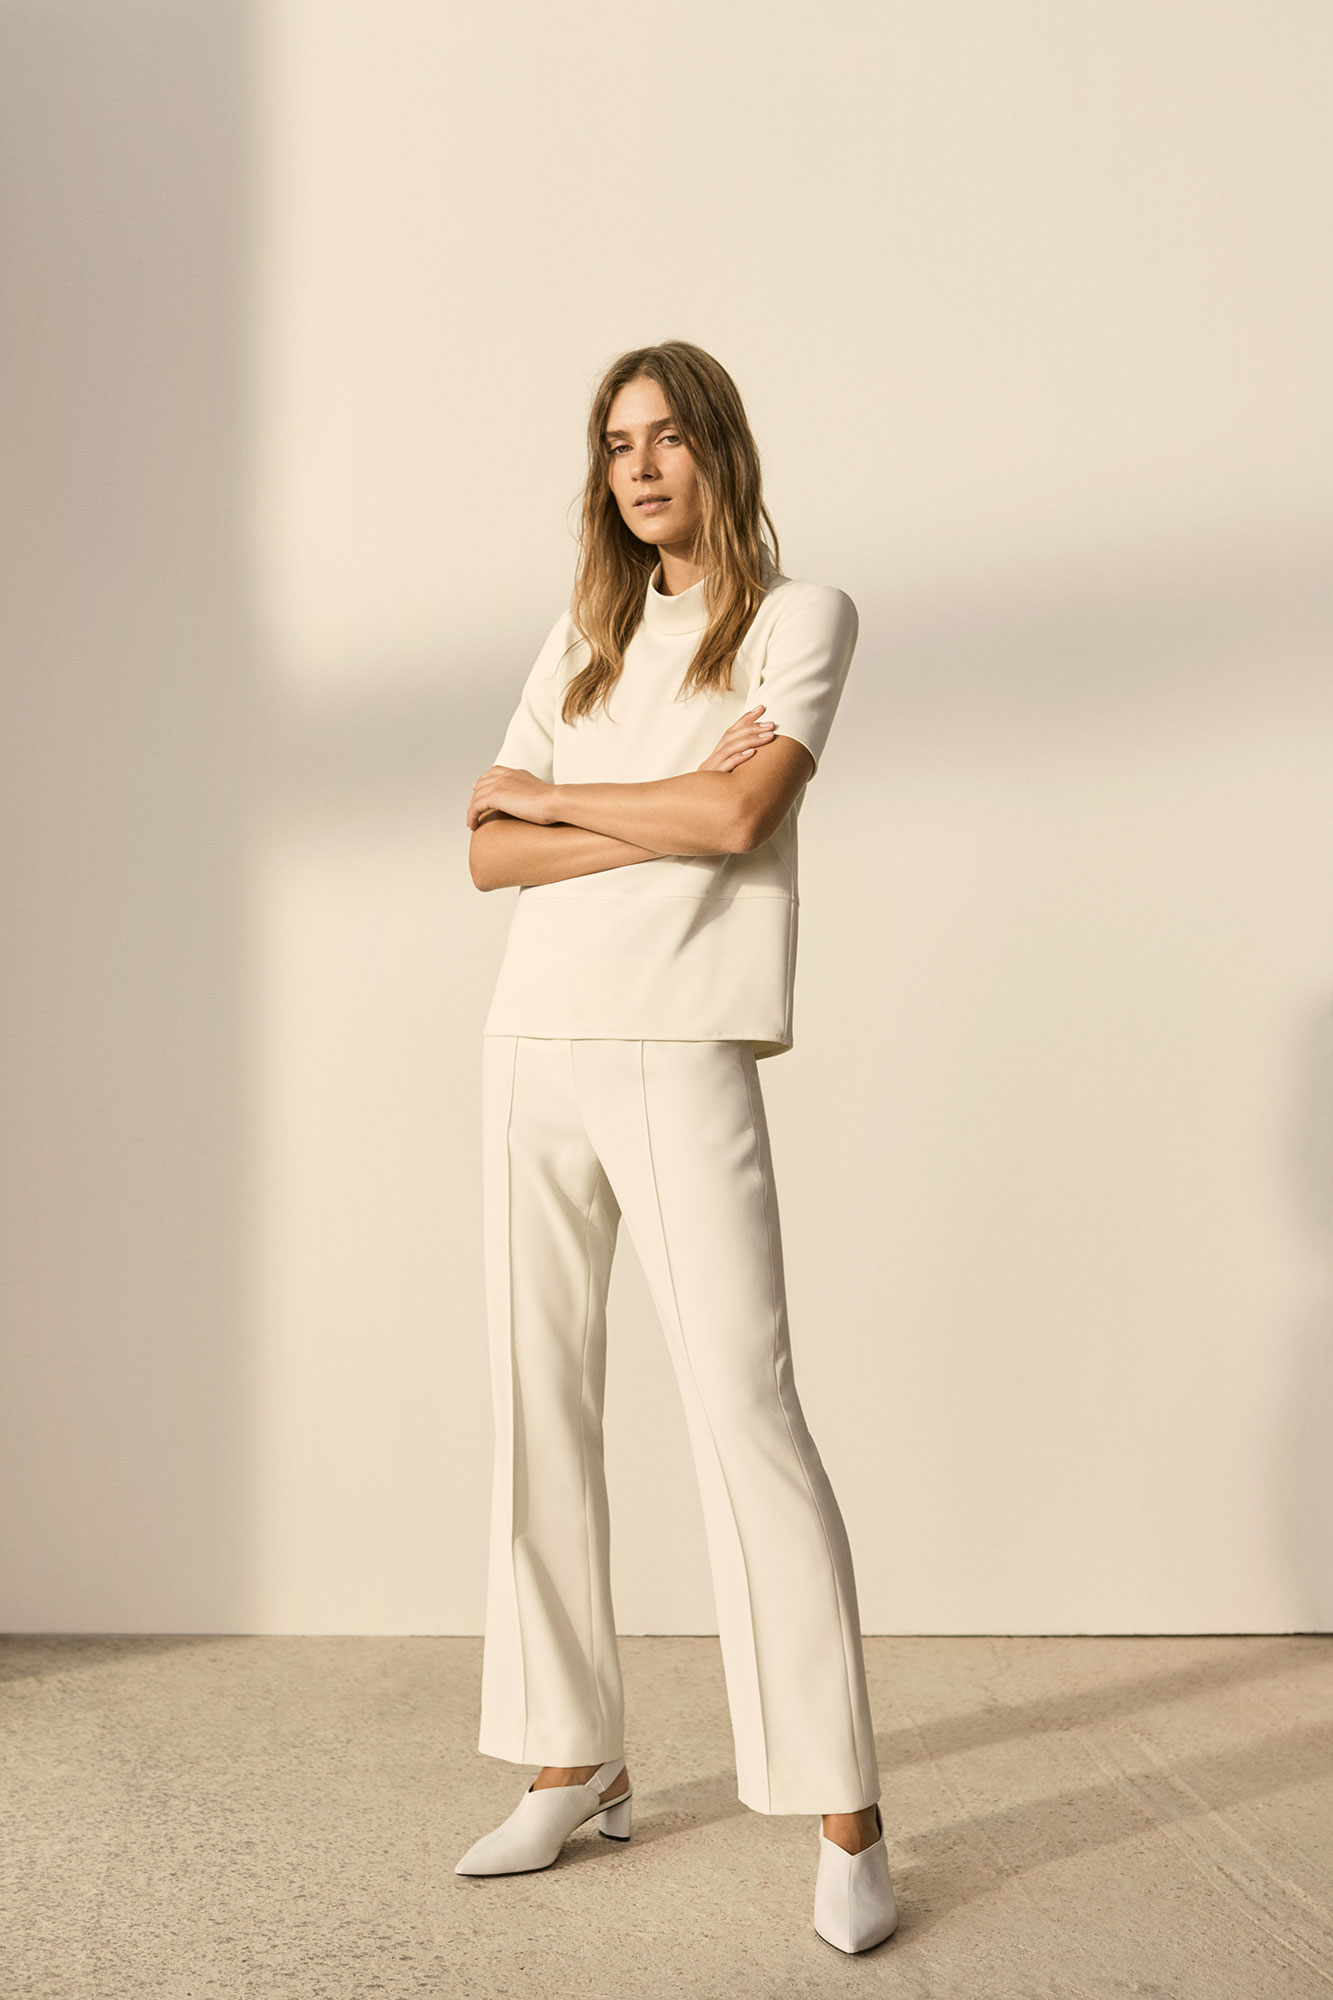 Mango Looks '18 | Roberto Manzotti | Diesel | IO donna | Melanie Huynh | Numerique Retouch Photo Retouching Studio